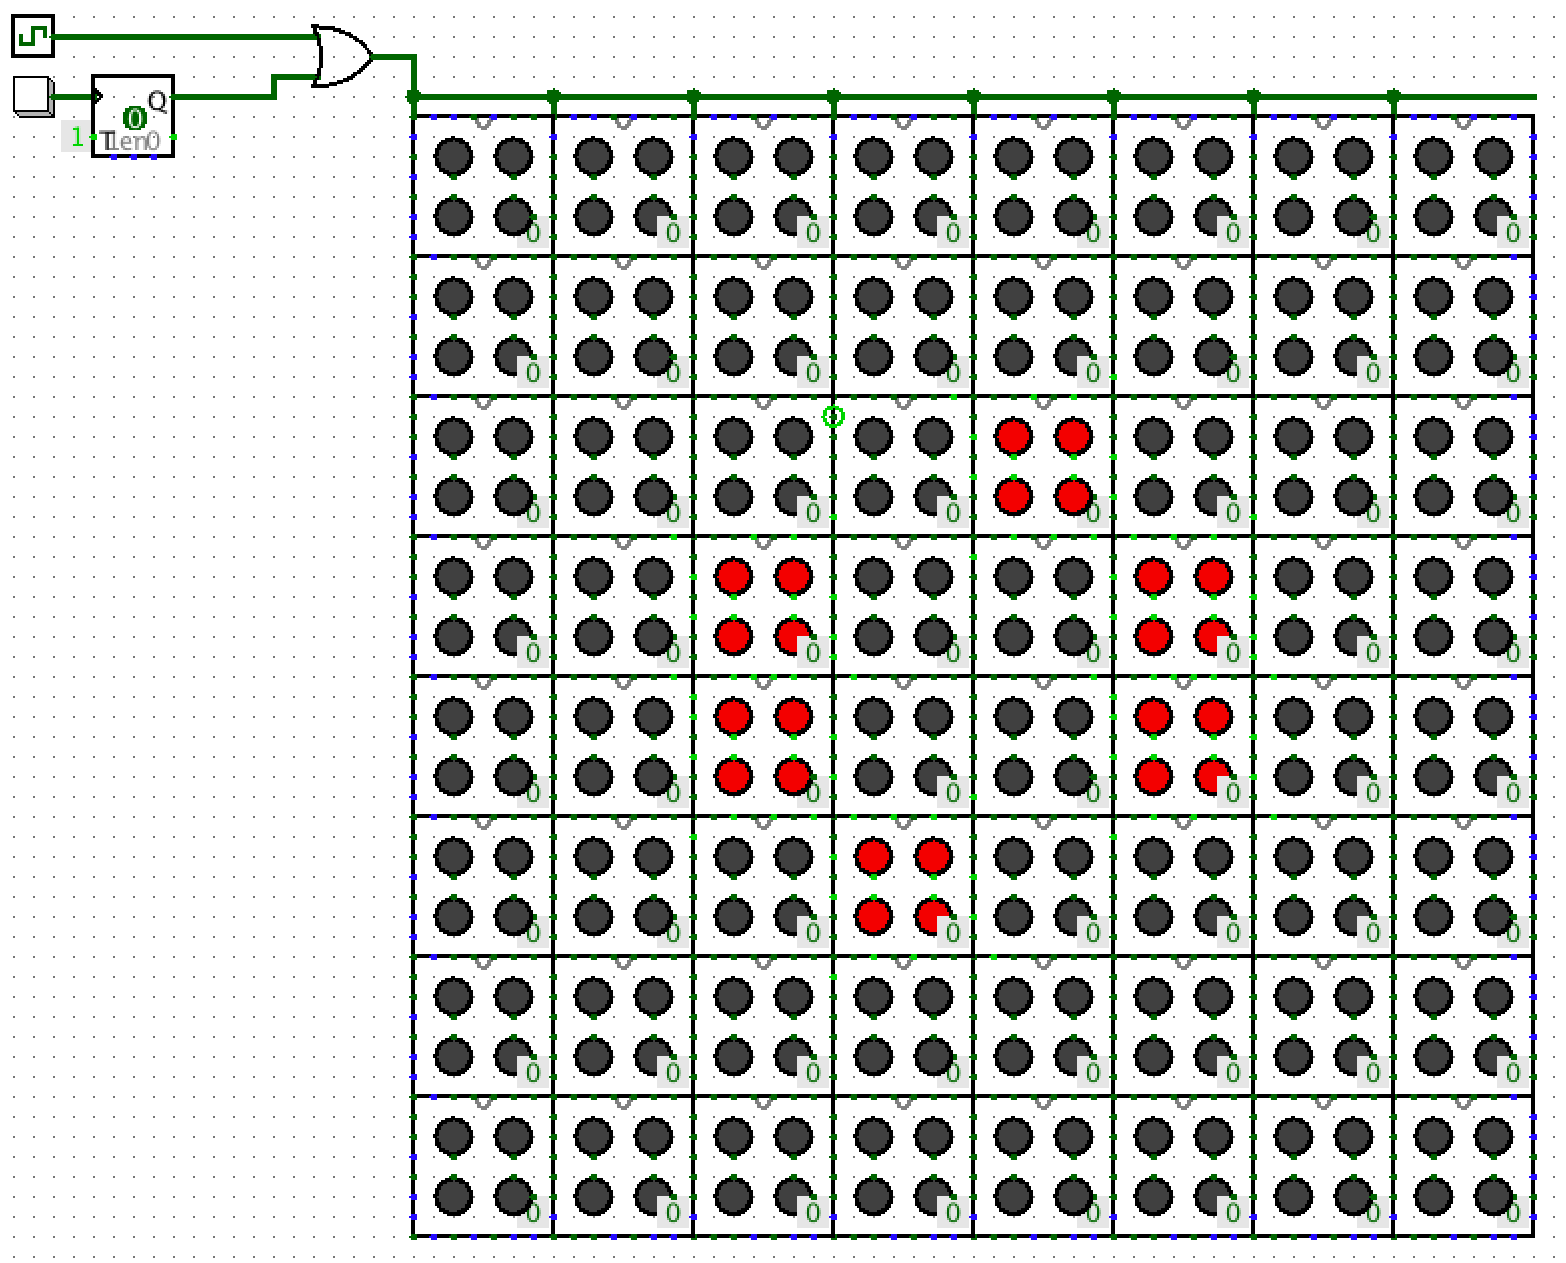 Modular Conways Game Of Life In Logisim Hexahedria Circuits